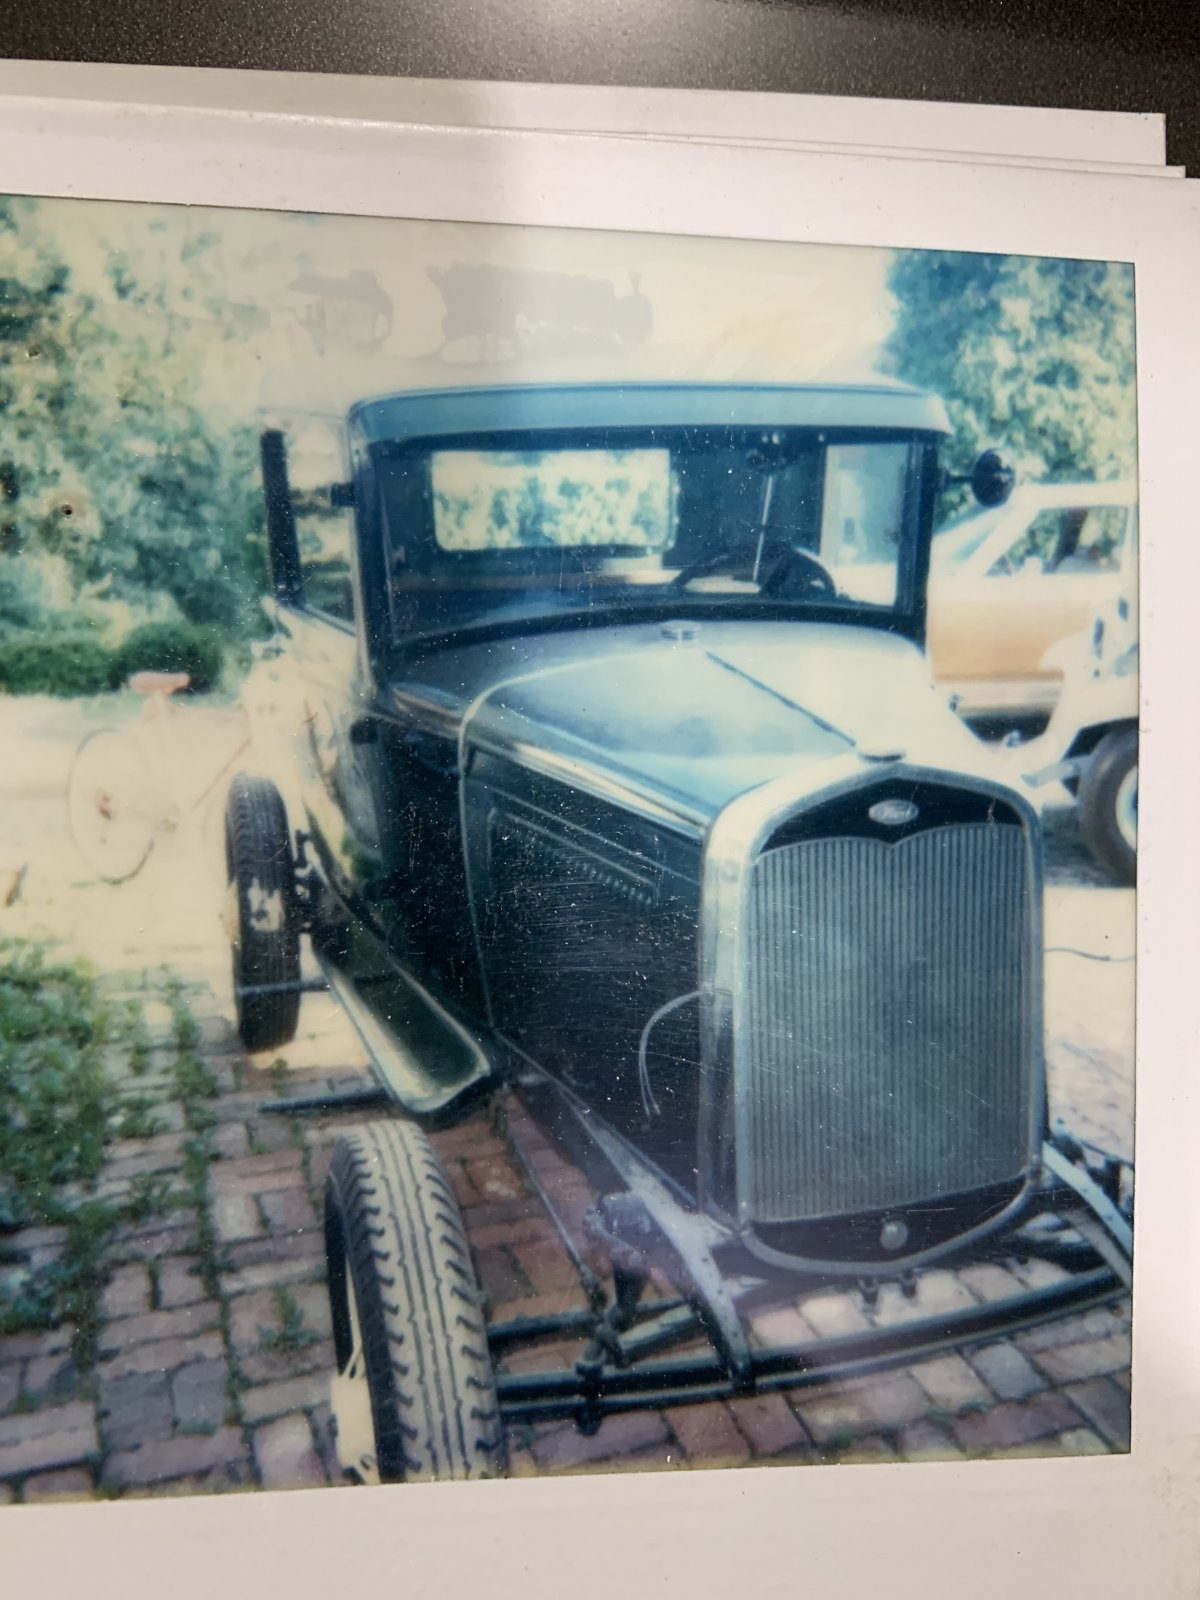 1931 Ford Model A Truck (Video) 3.jpg